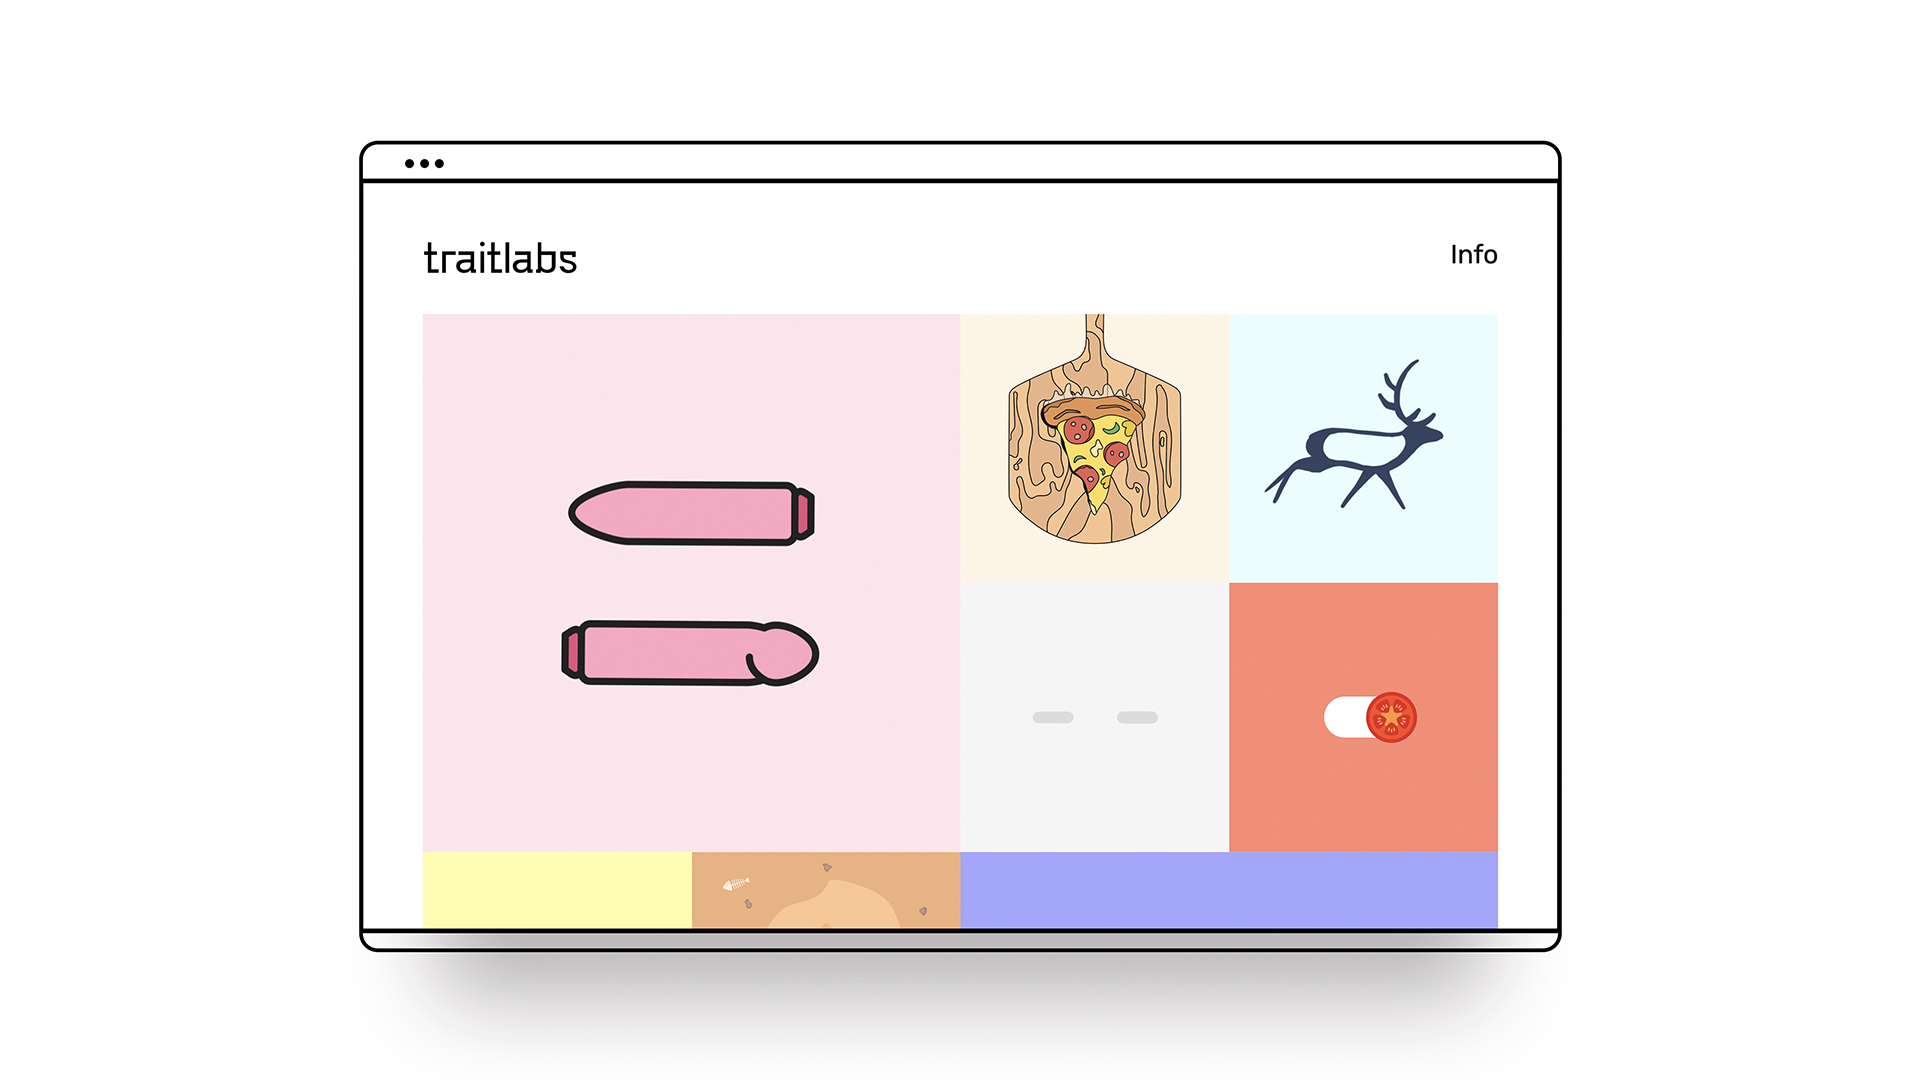 Trait labs website inside an illustrative browser